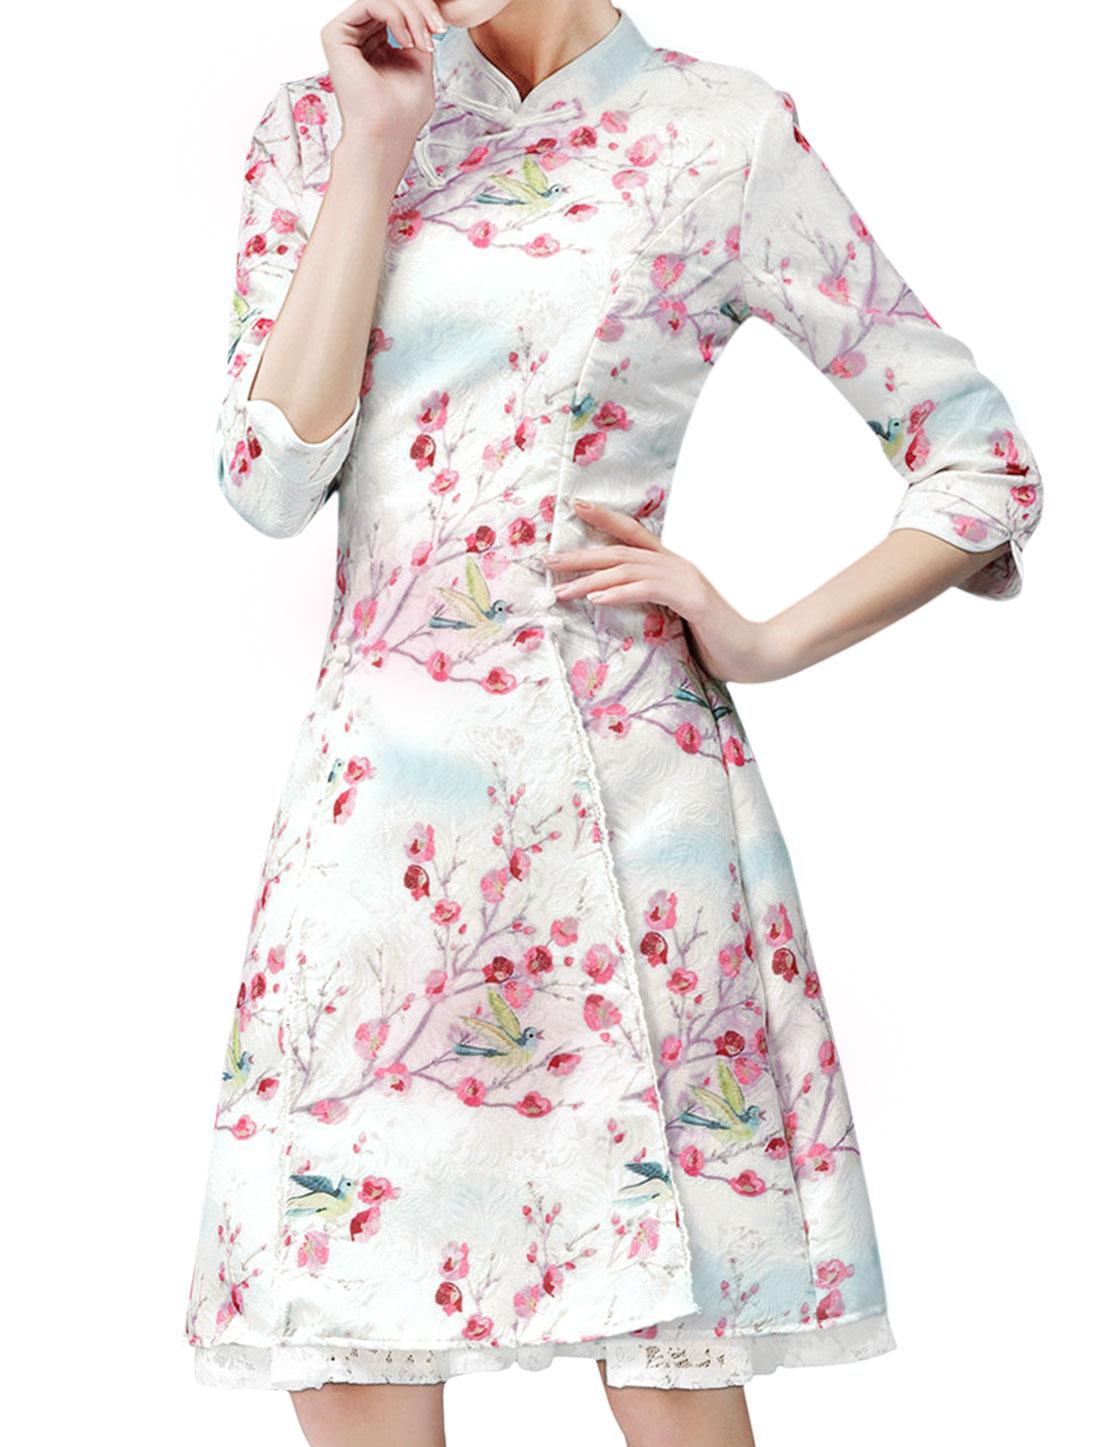 Women Mandarin Collar Floral Birds Print Lace Panel Split Hem Midi Dress White M